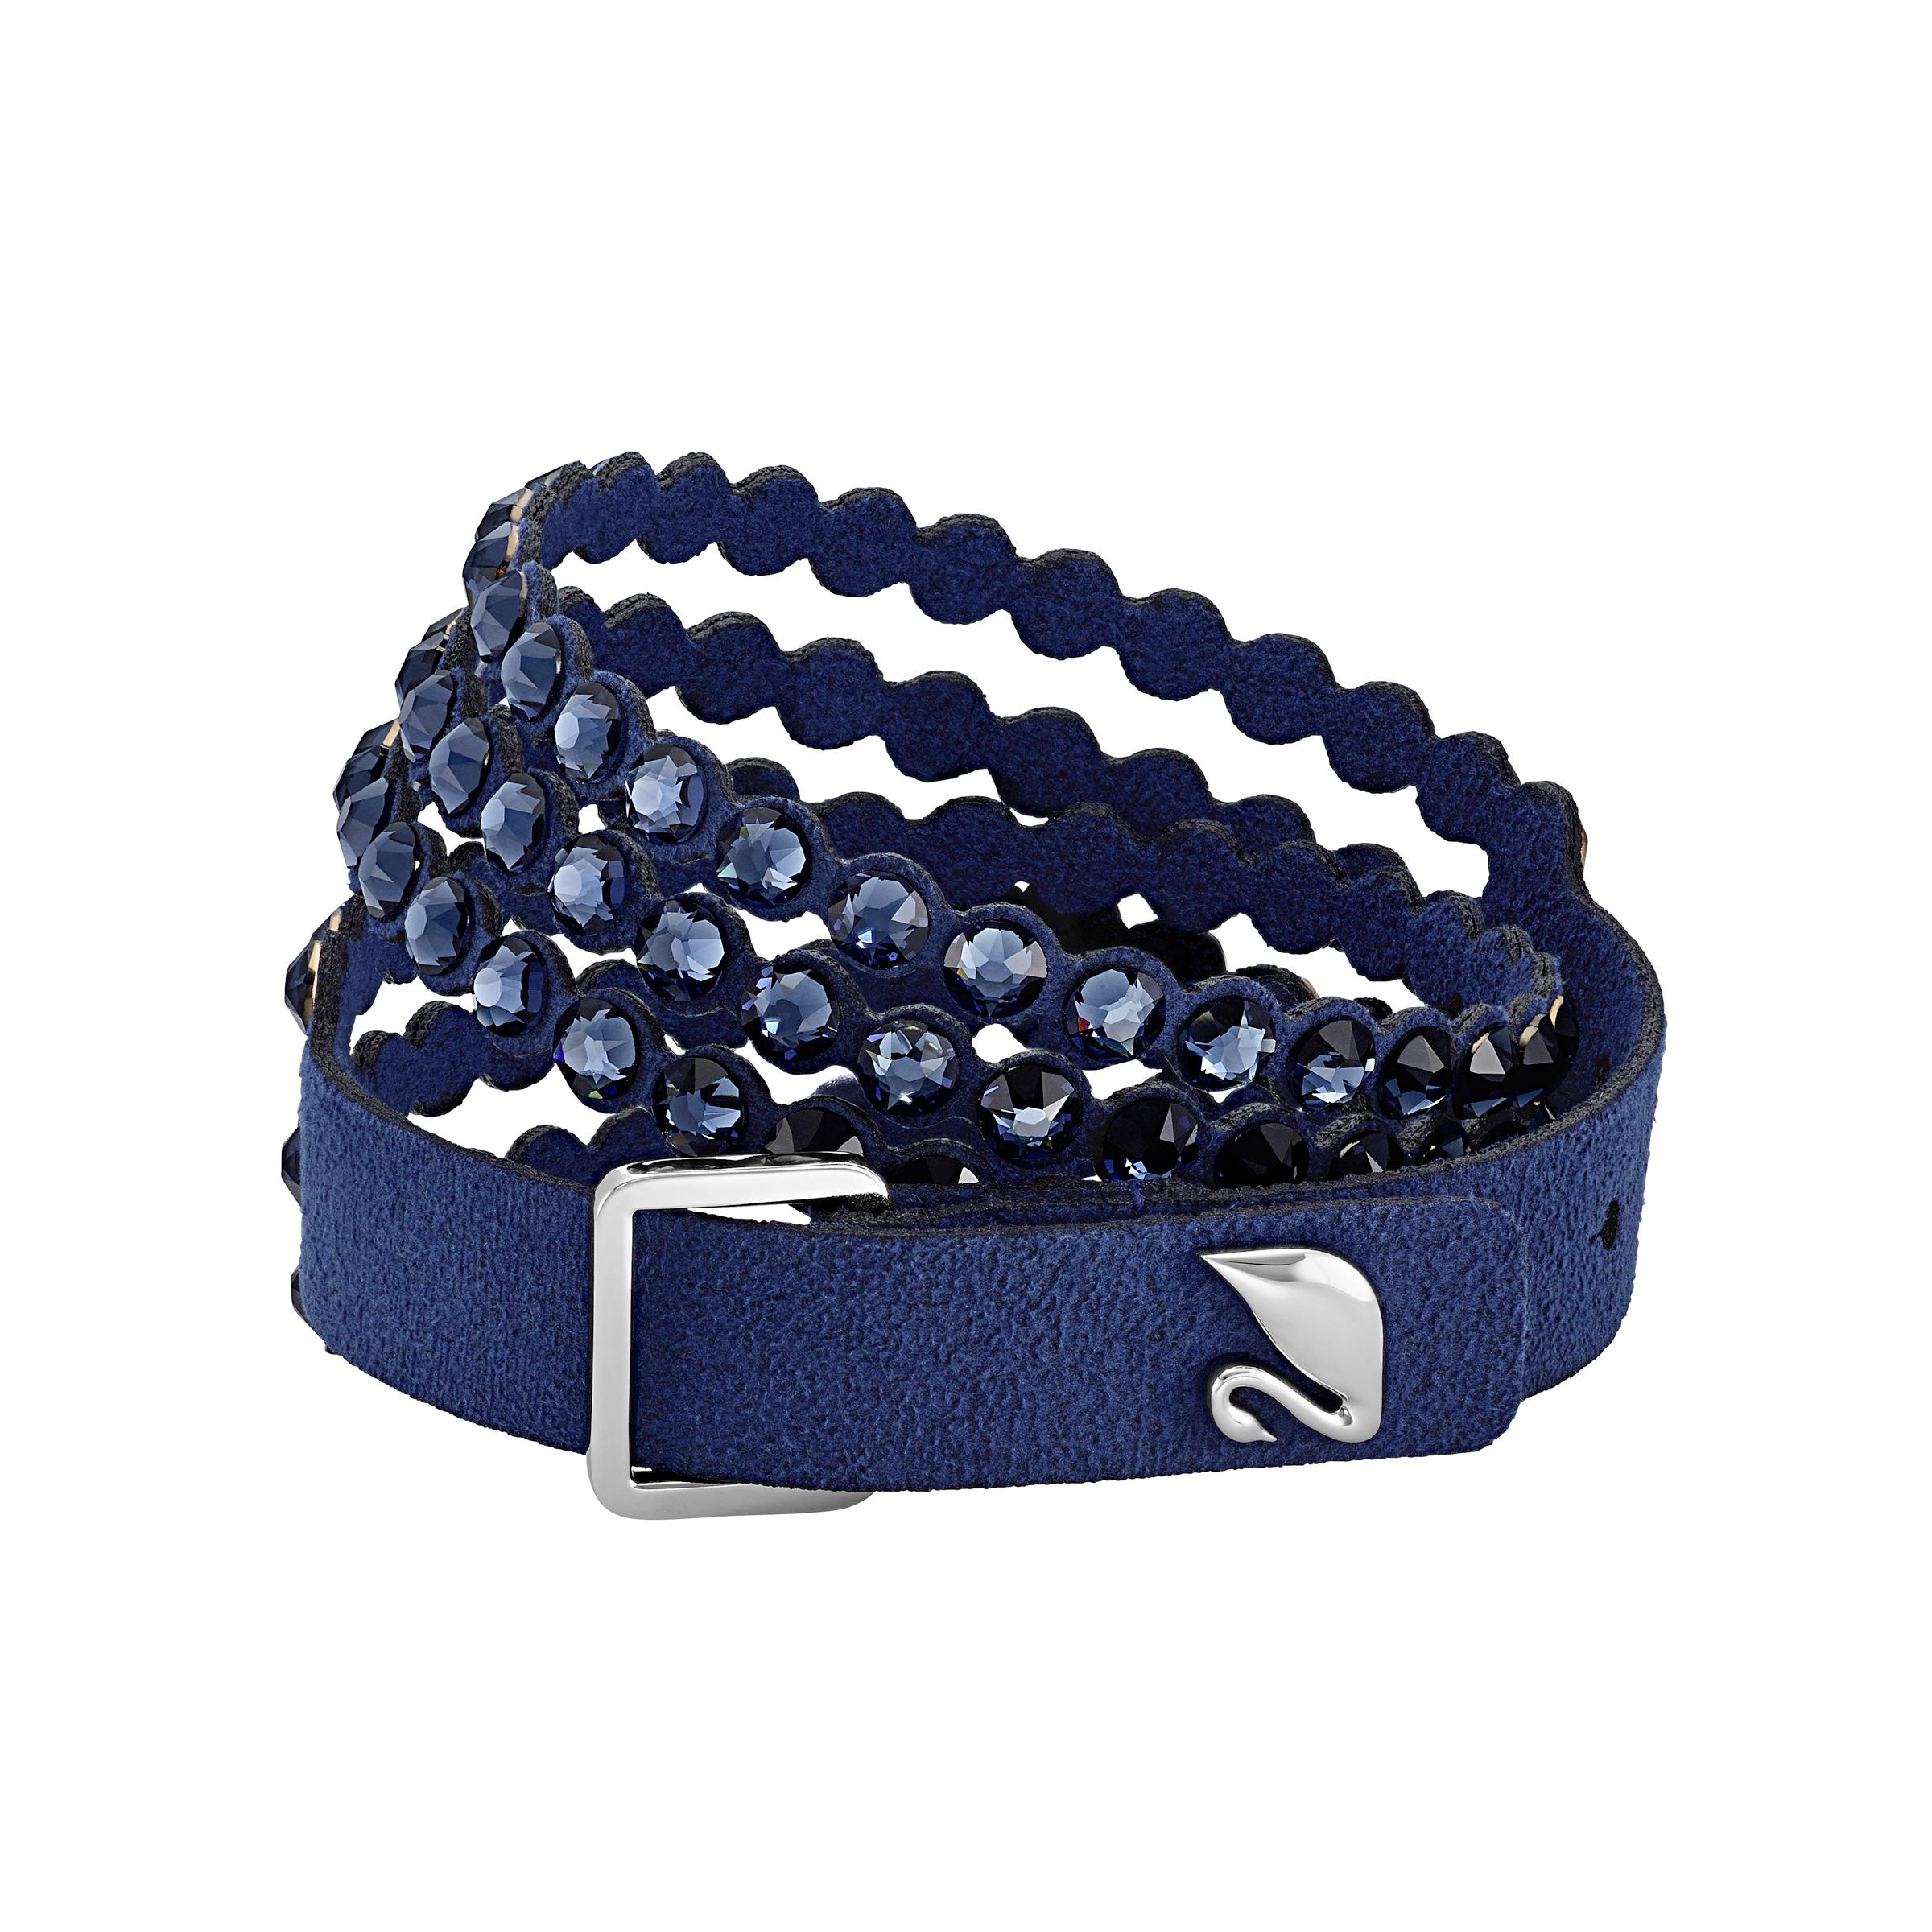 Bracelet Swarovski Power Collection, bleu, Swarovski